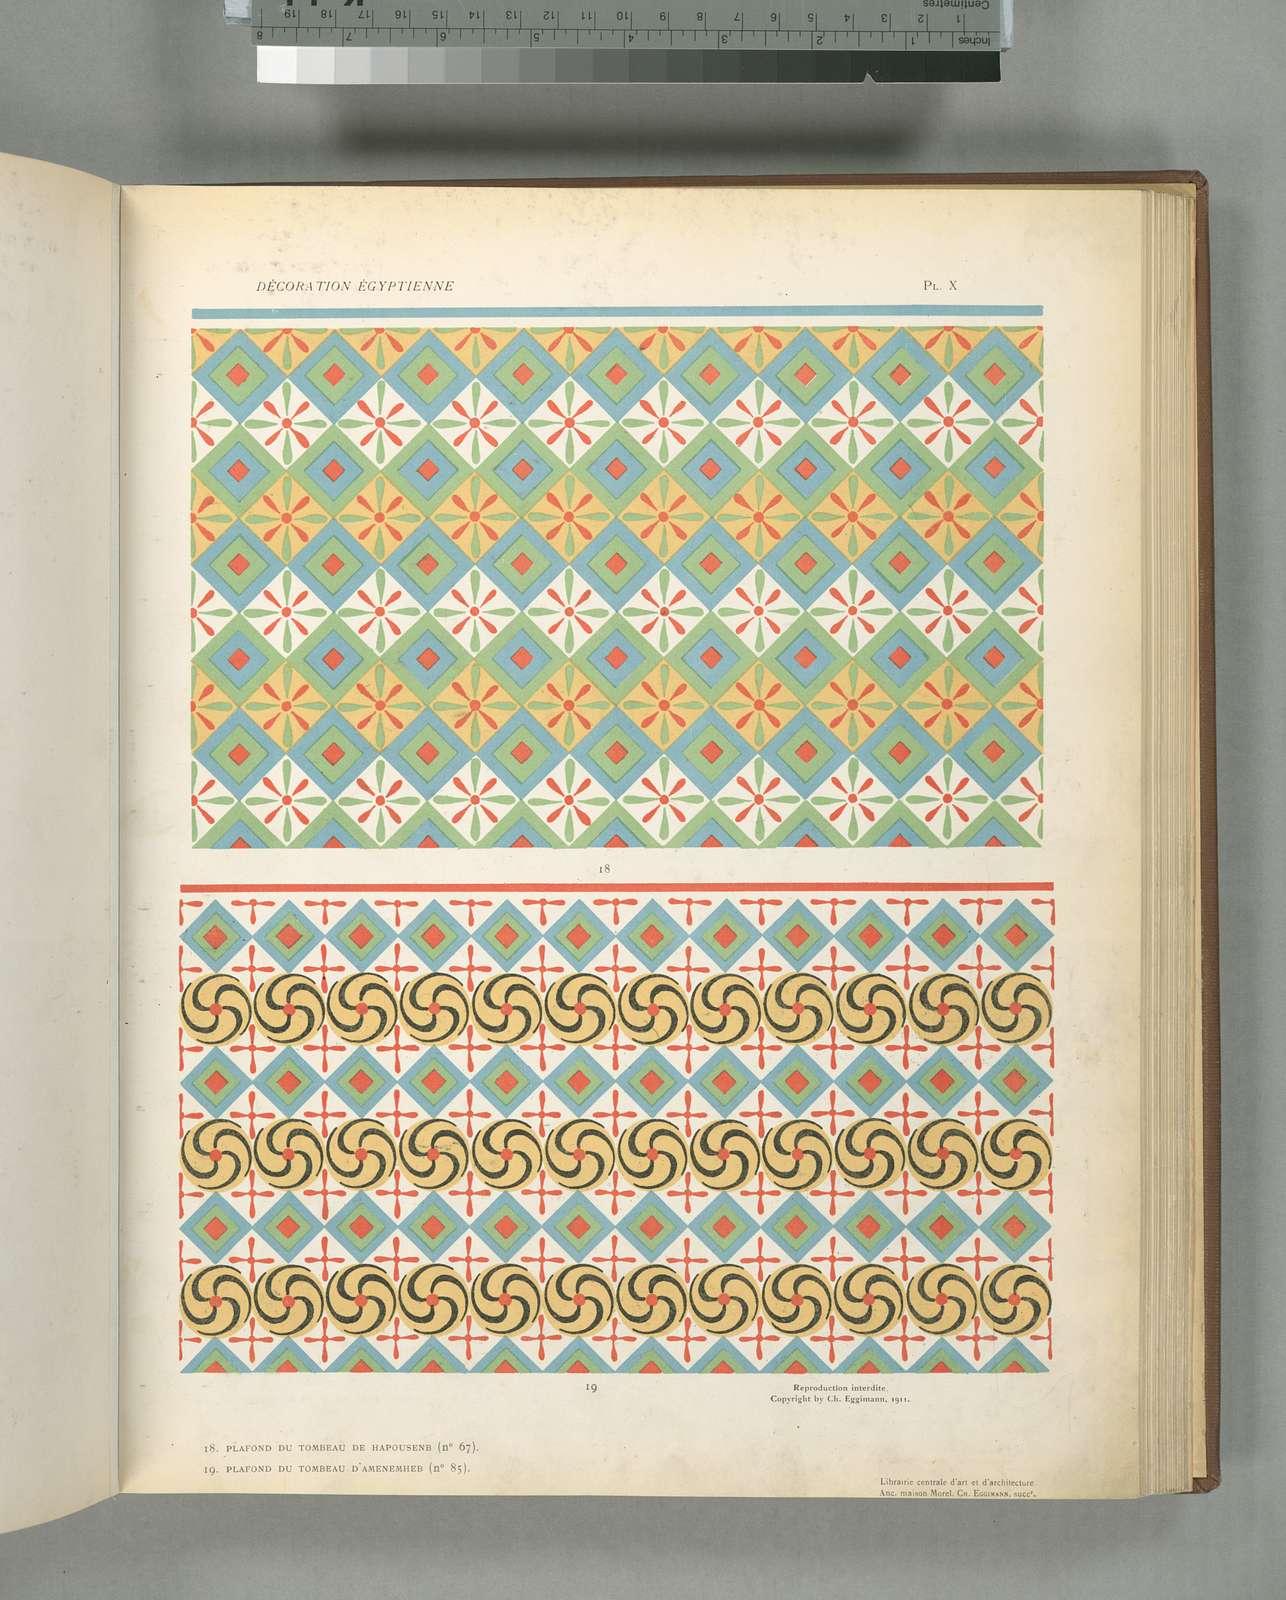 18. Plafond du Tombeau de Hapousenb (n° 67), 19. Plafond du Tombeau D'amenemheb (n° 85)